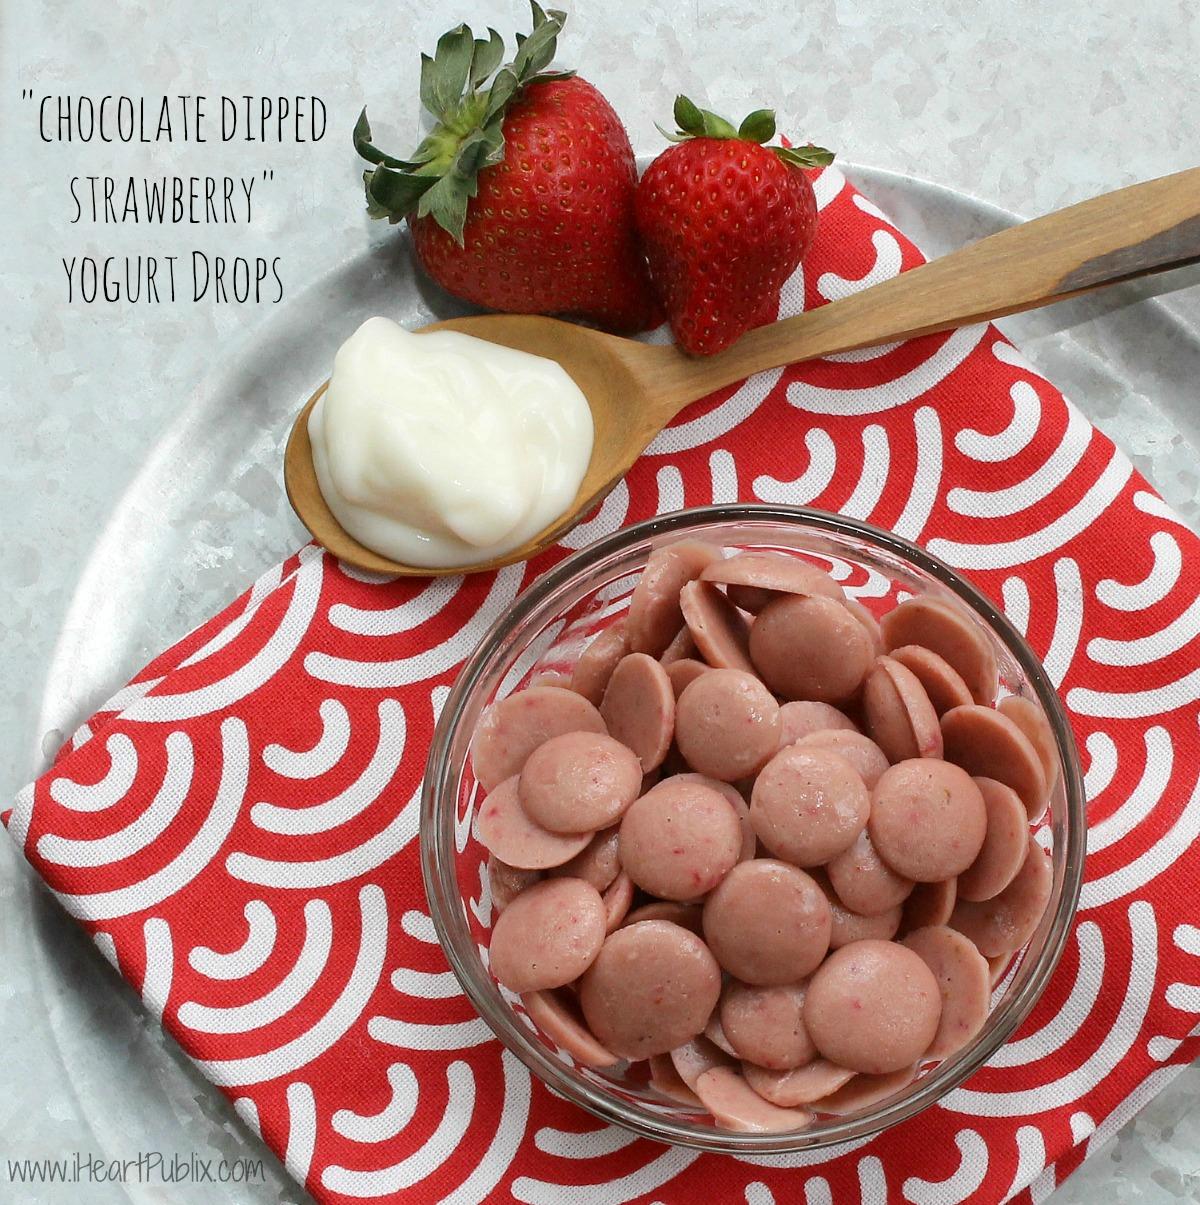 Chocolate Dipped Strawberry Yogurt Drops